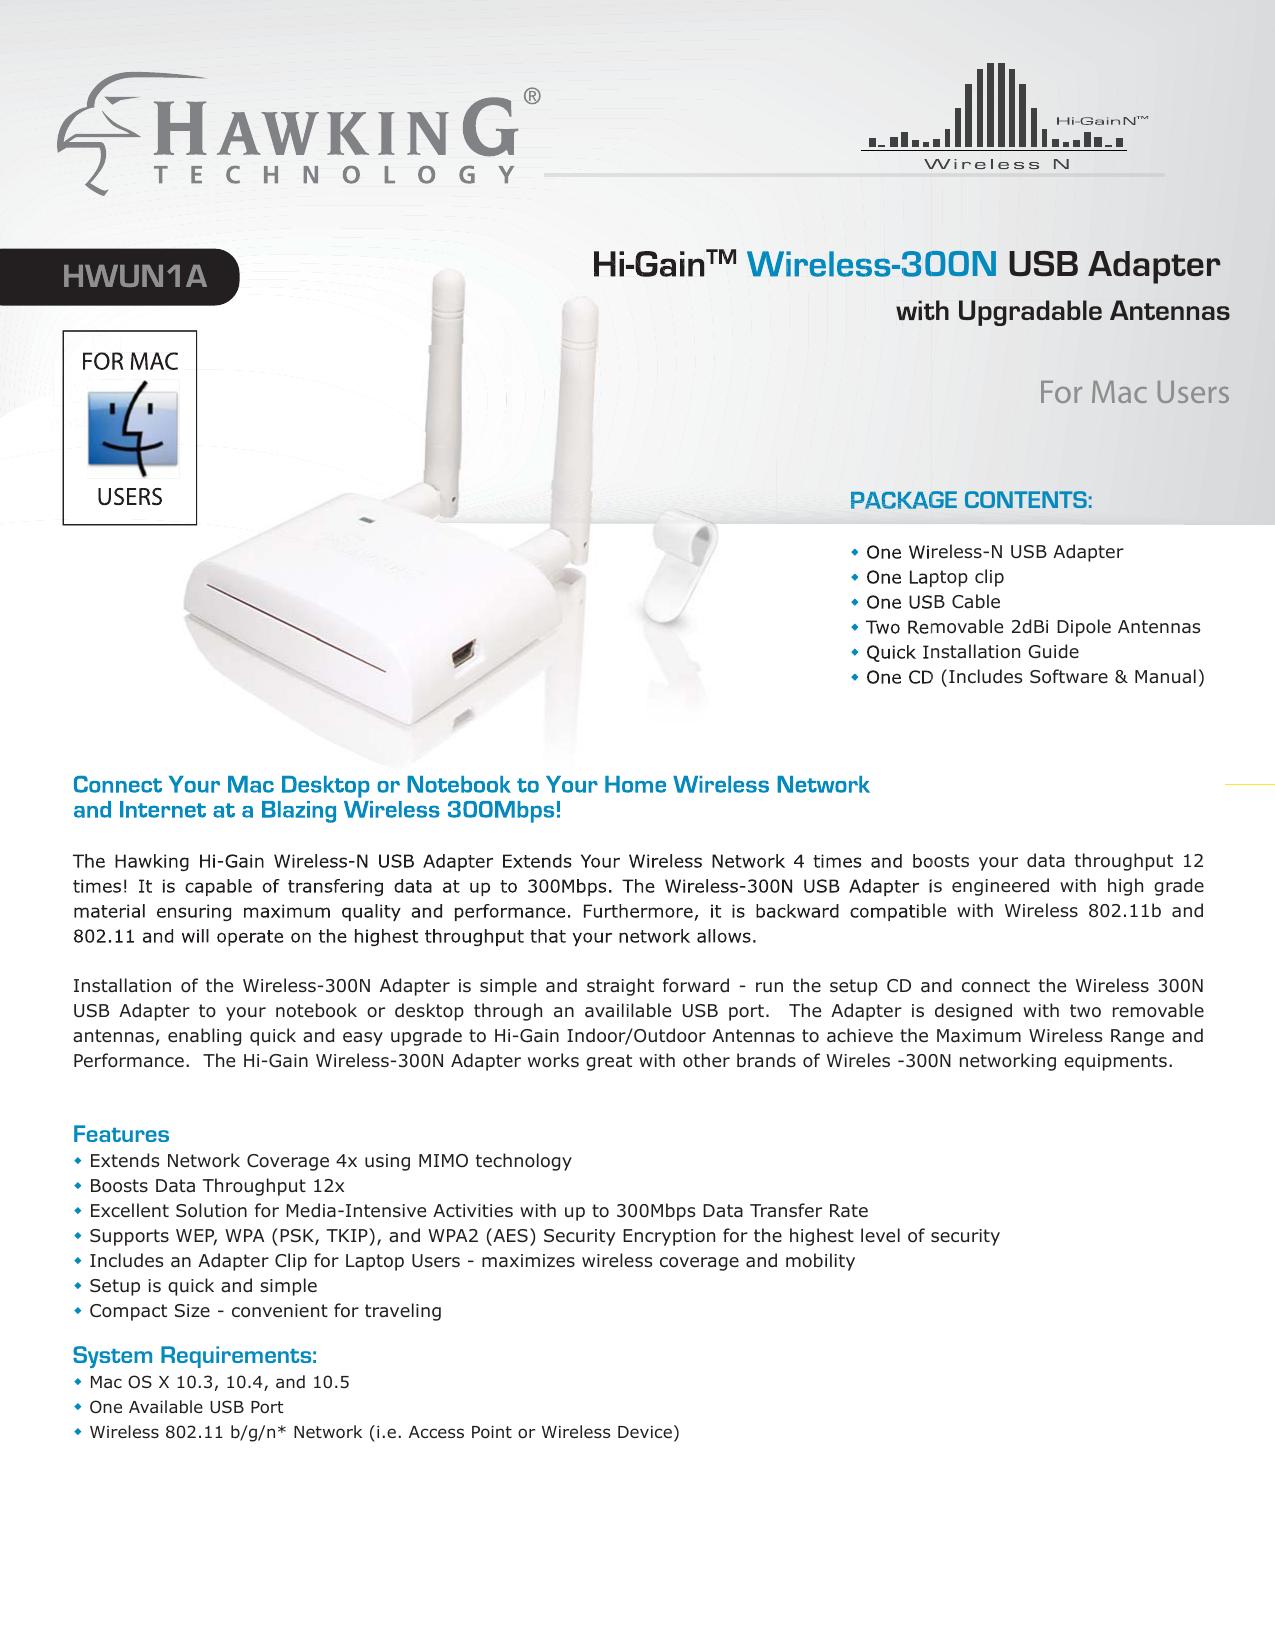 HAWKINGTECH WIRELESS-G USB ADAPTER WITH REMOVABLE ANTENNA DRIVERS WINDOWS 7